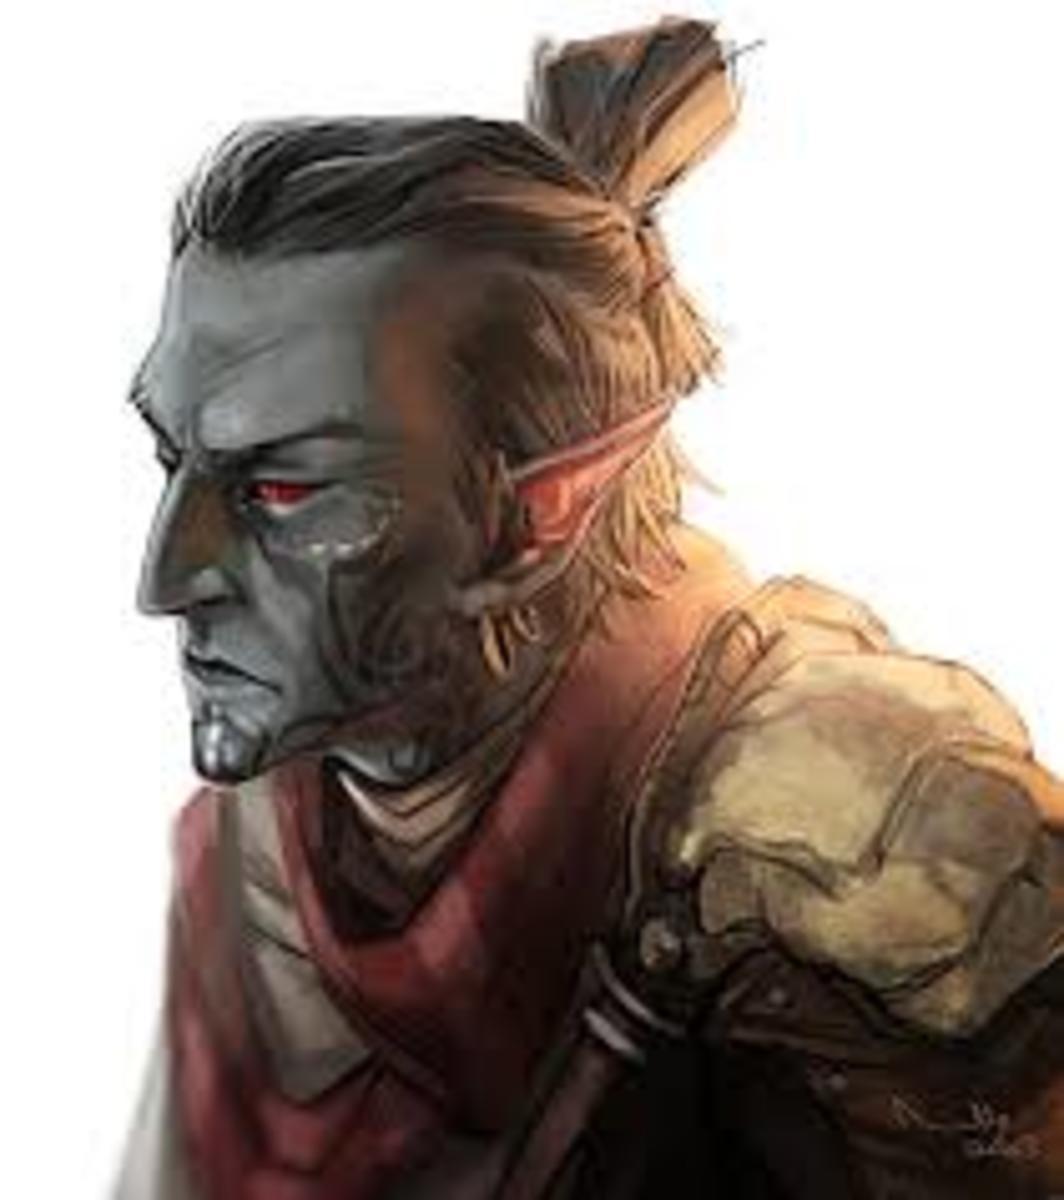 Morrowind shall rise again!